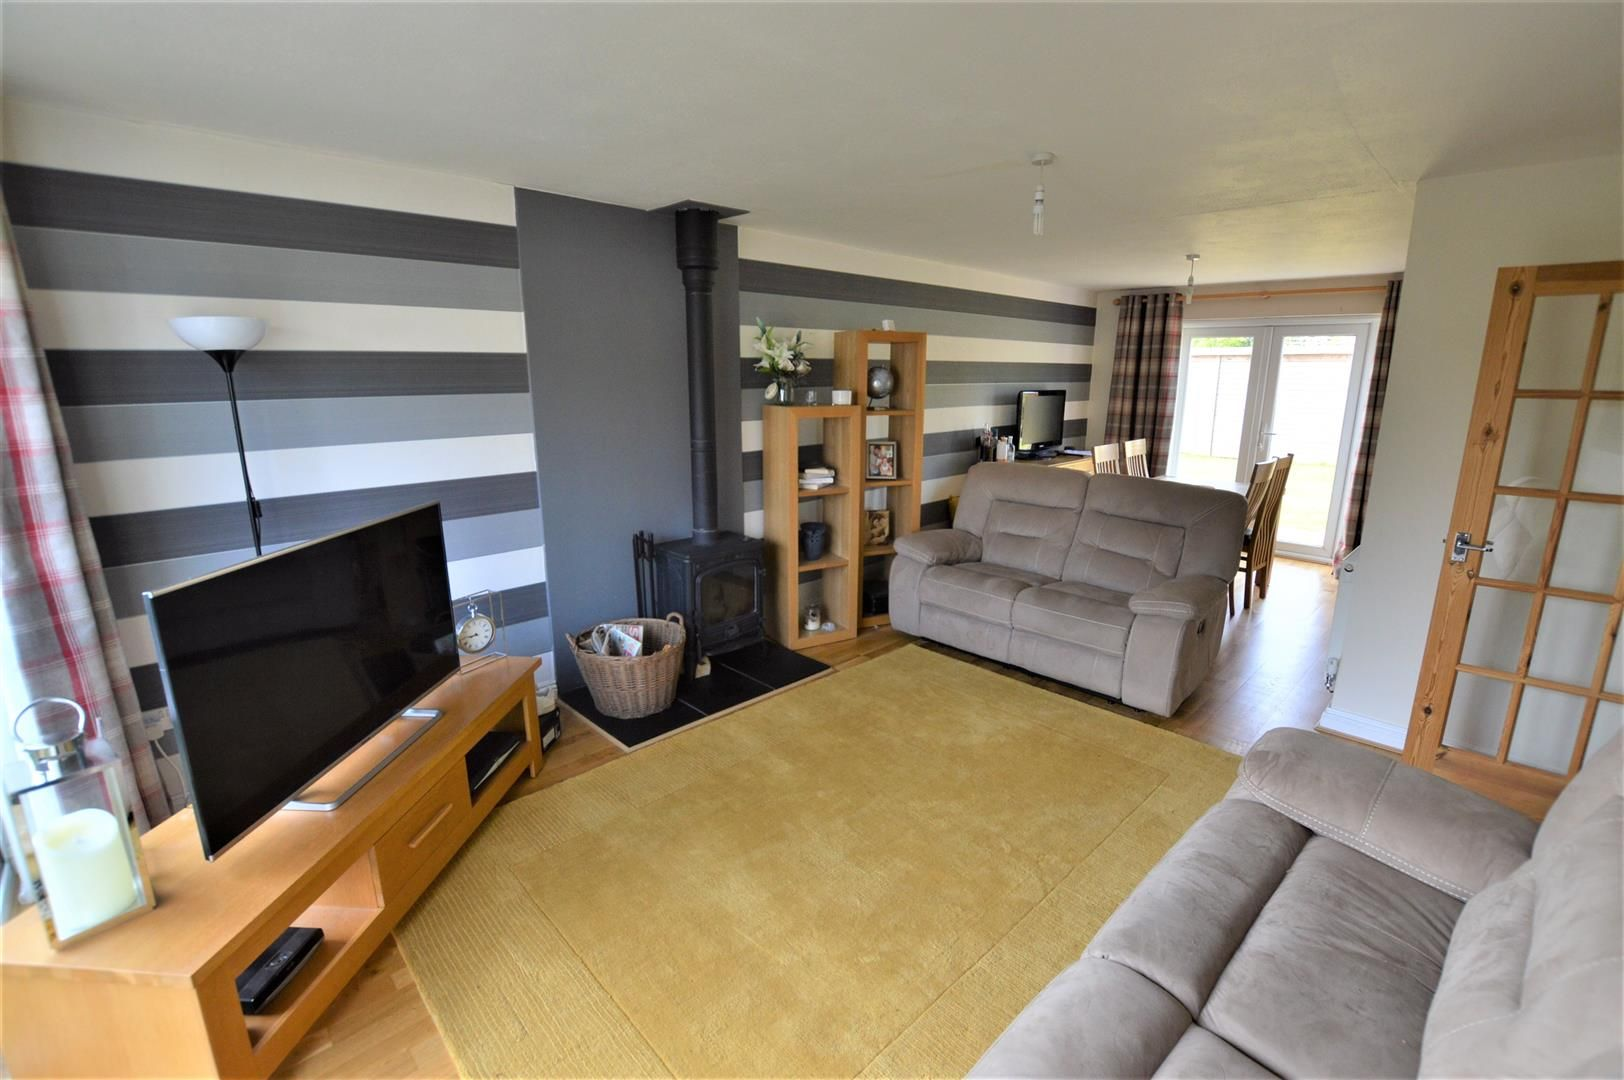 3 bed detached for sale in Leominster 2